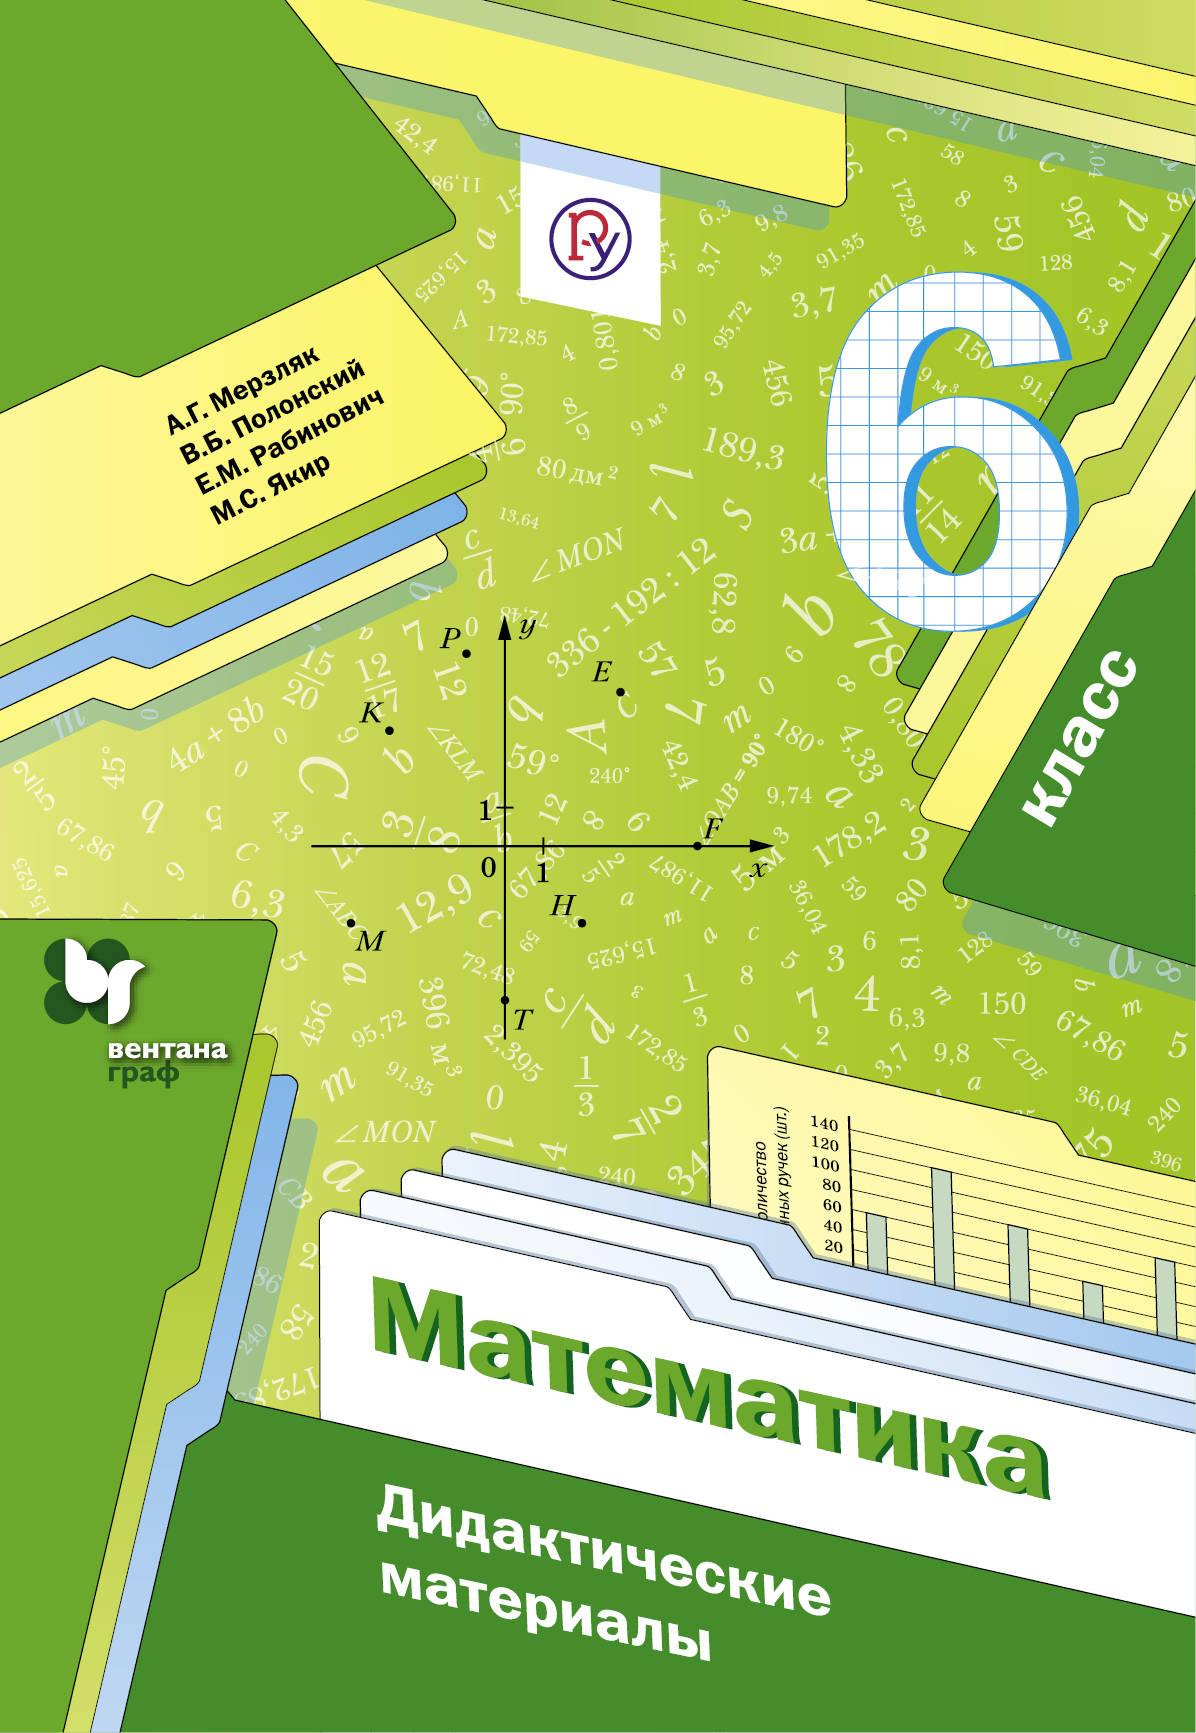 А. Г. Мерзляк,В. Б. Полонский,Е. М. Рабинович,М. С. Якир Математика. 6класс. Дидактические материалы цены онлайн